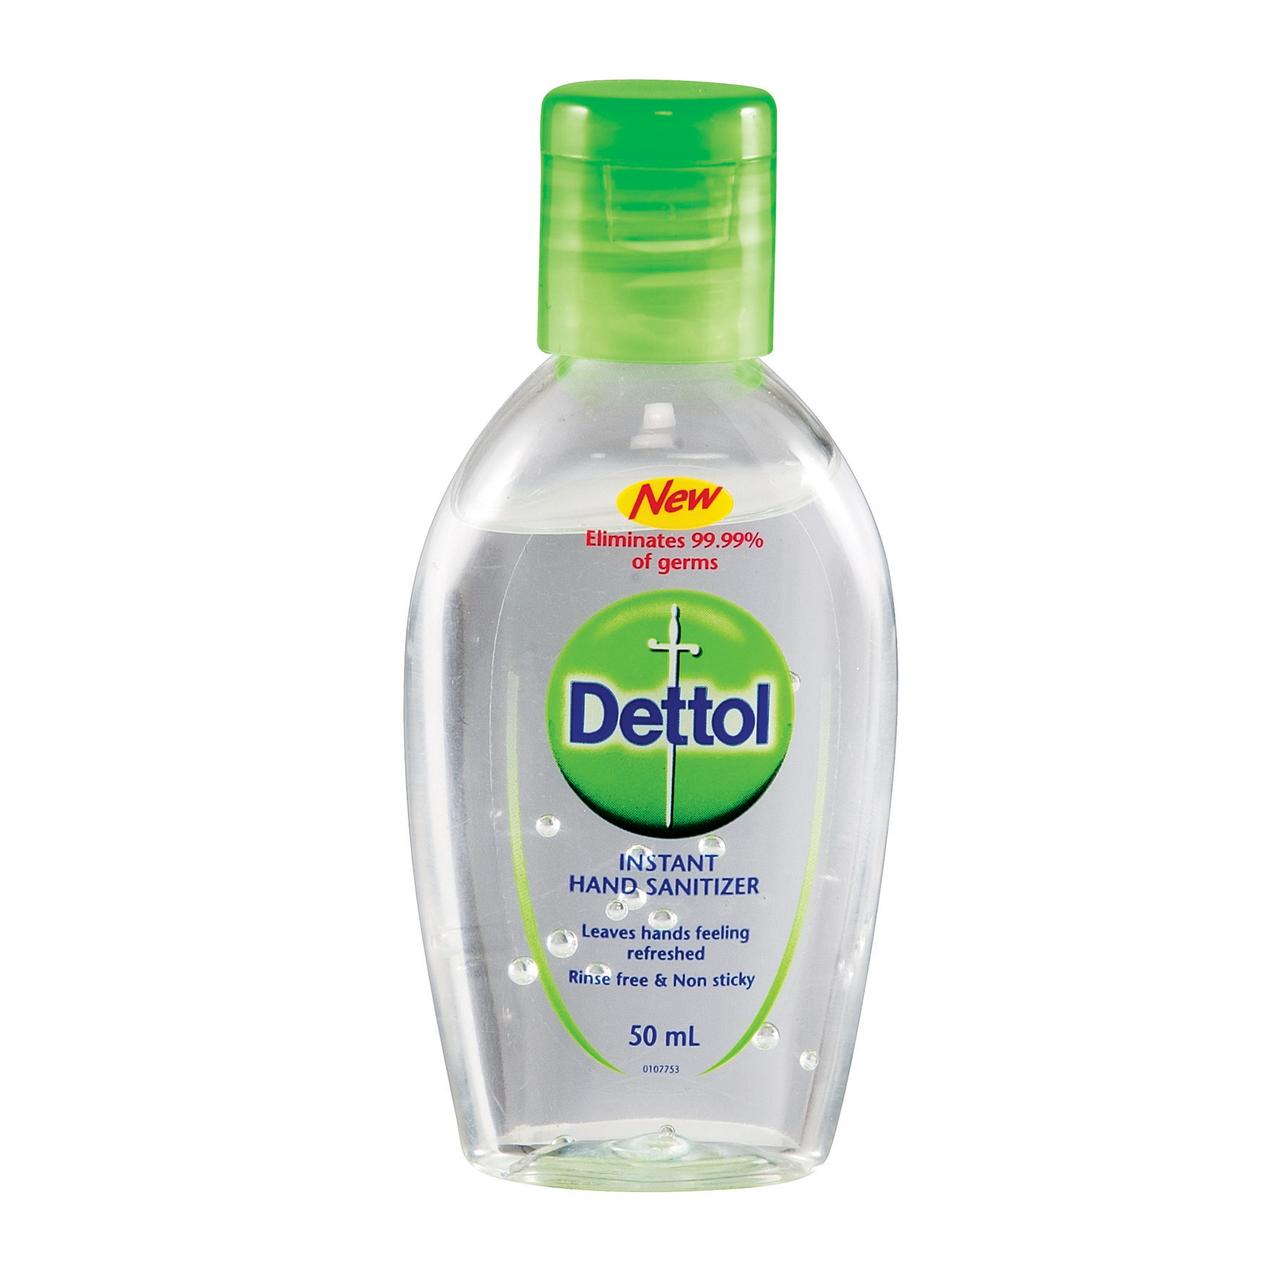 Dettol Hand Sanitizer Refresh 50 Ml Daftar Harga Terkini Dan Original 4 Pcs Sanitiser With Trusted Protection